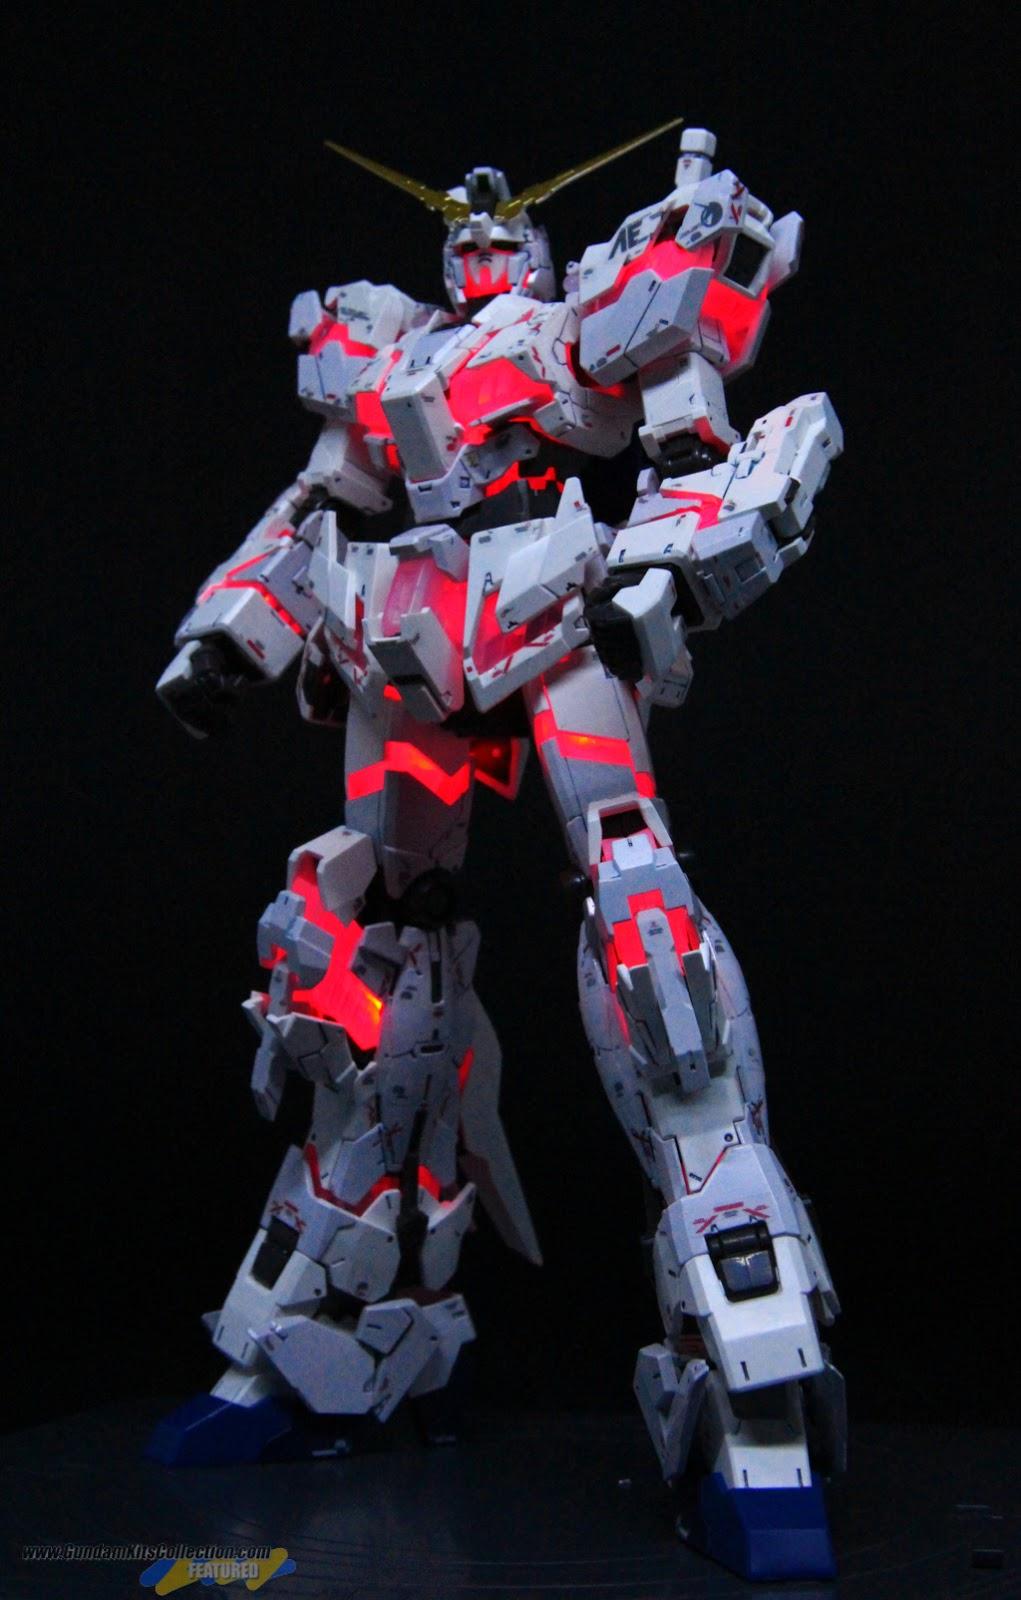 Painted Build: RG 1/144 Unicorn Gundam [Destroy Mode] Lighting Model ver. TWC - Gundam Kits Collection News and Reviews